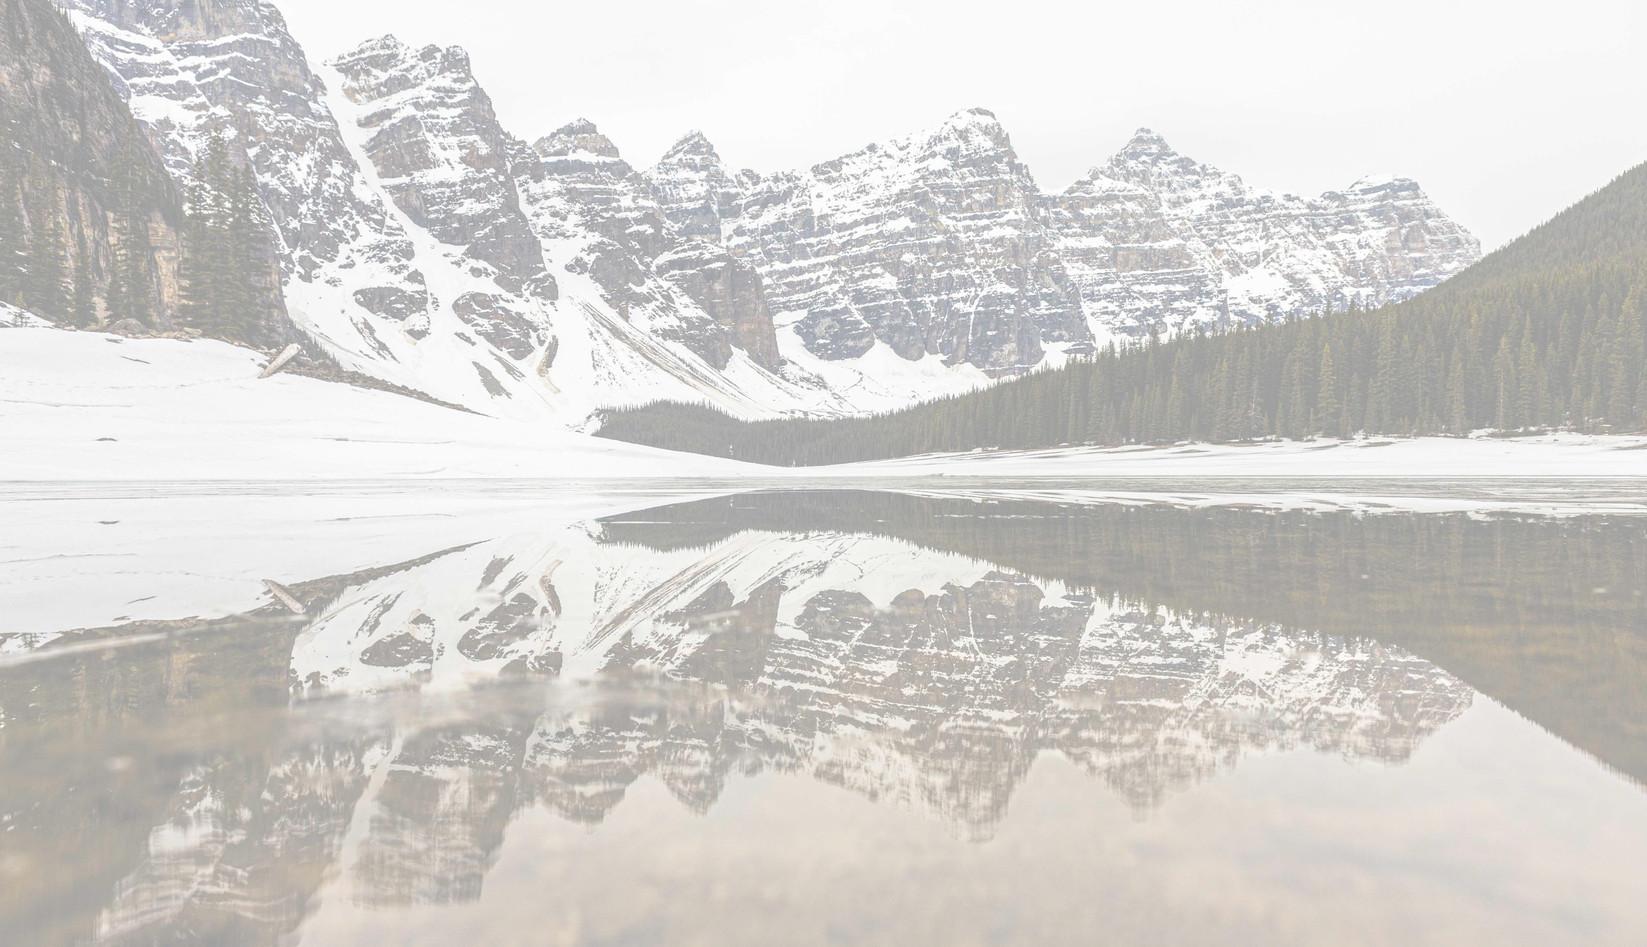 Moraine_Lake_Reflection_Canada_Banff-1_e